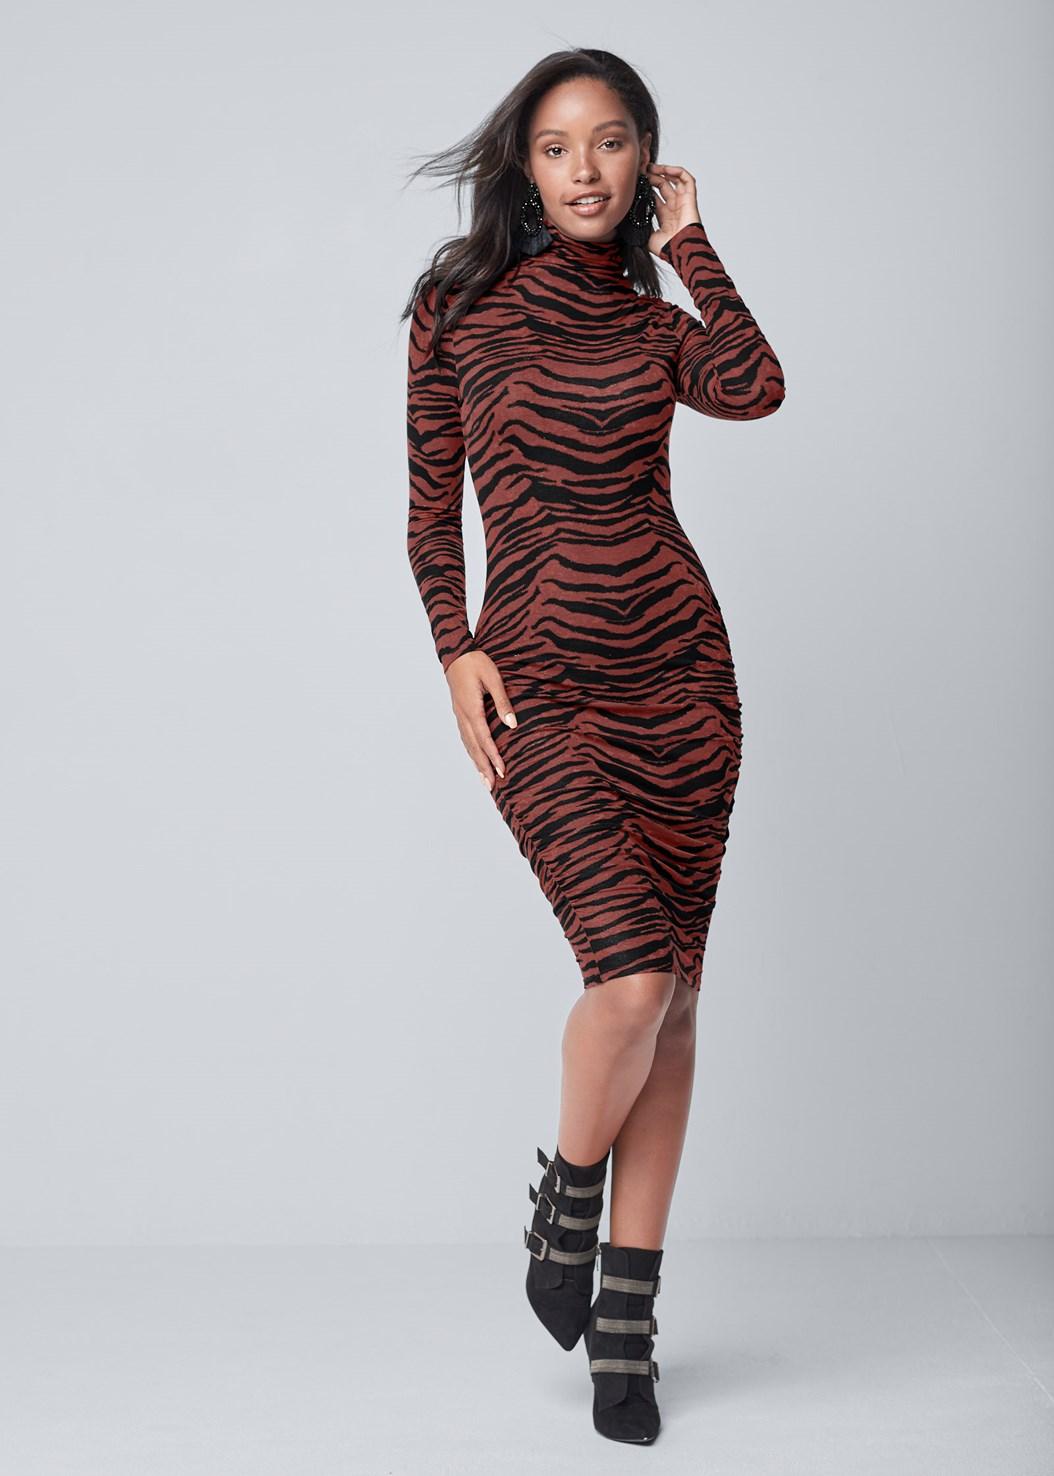 Long Sleeve Ruched Dress,Wirefree Comfort Bra,Beaded Tassel Earrings